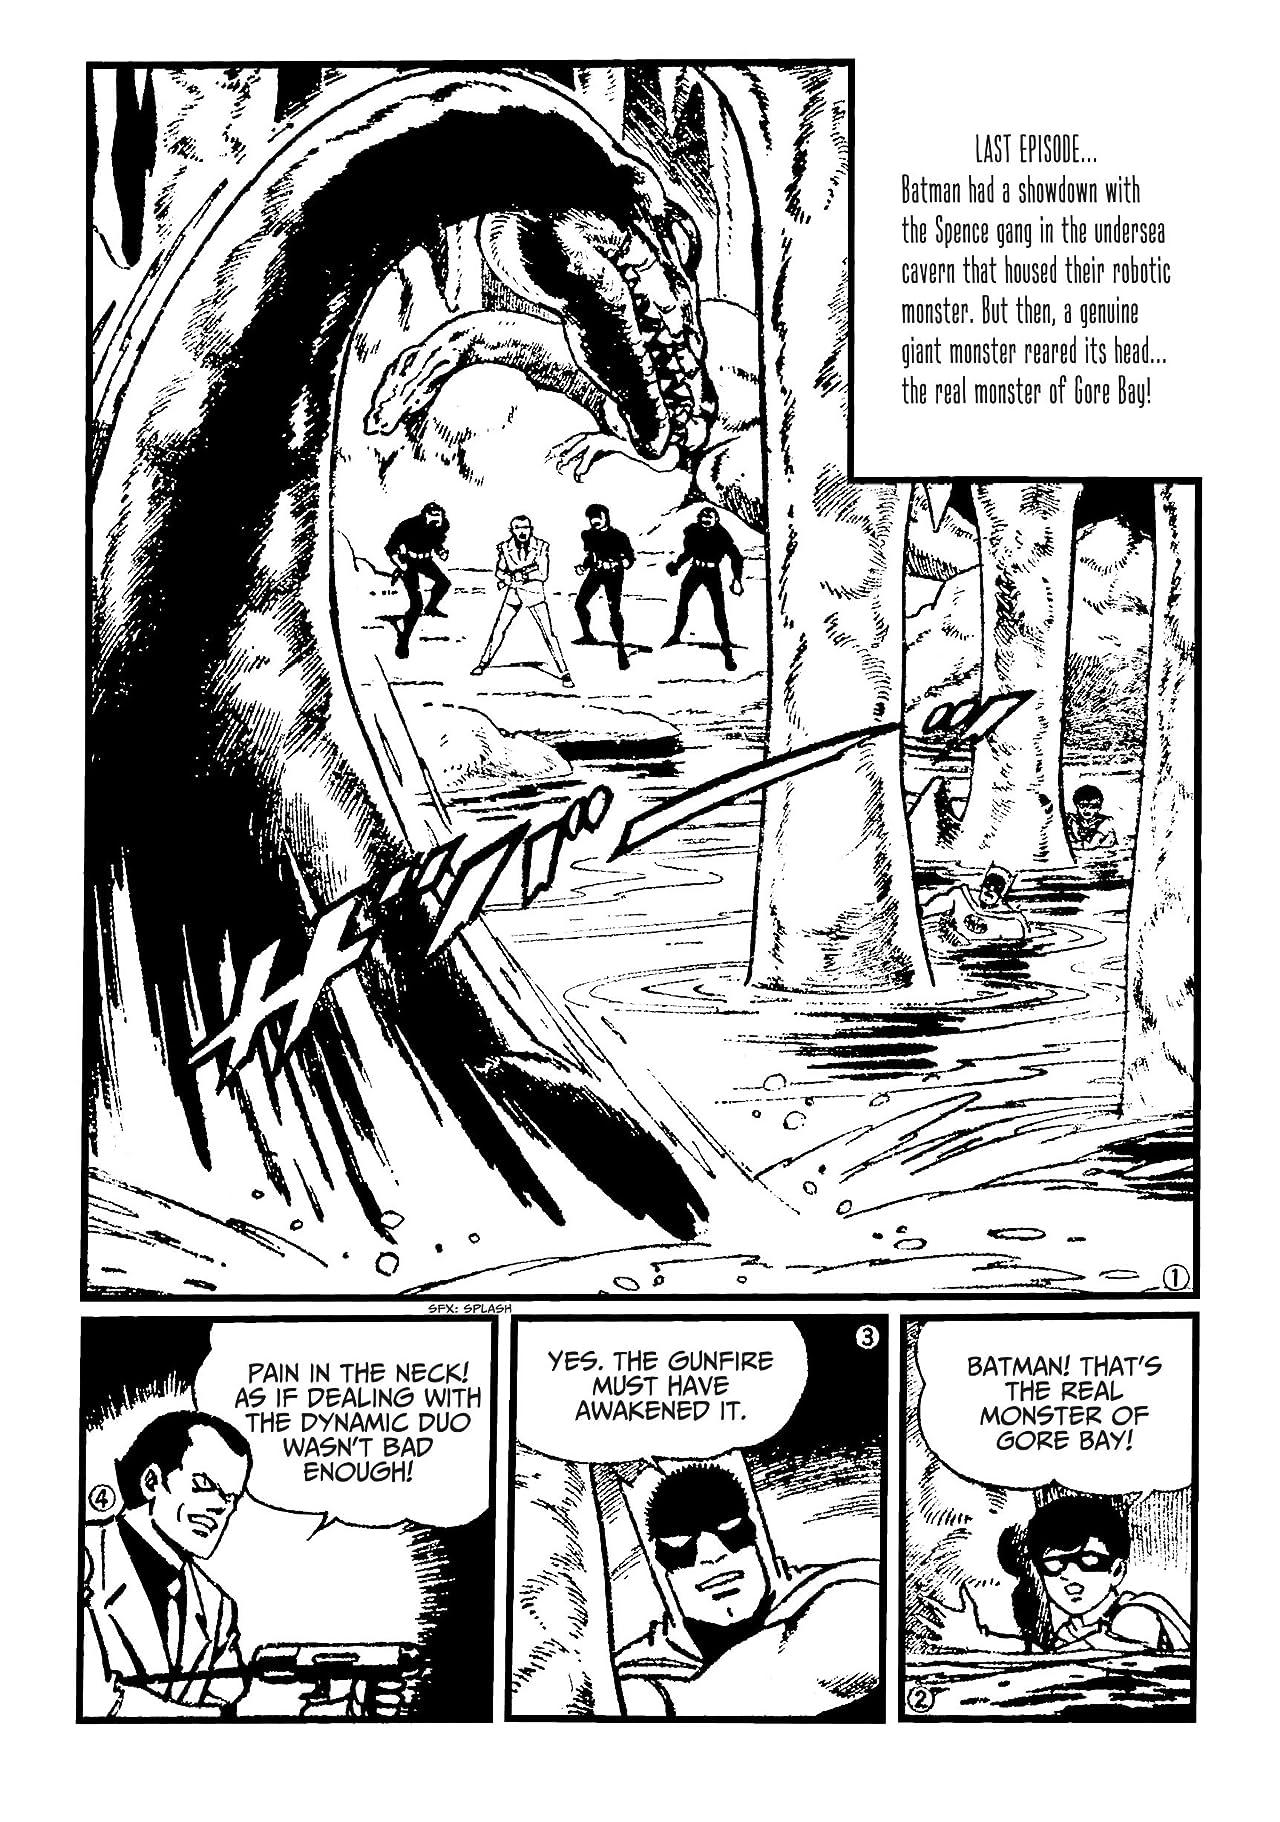 Batman: The Jiro Kuwata Batmanga #39